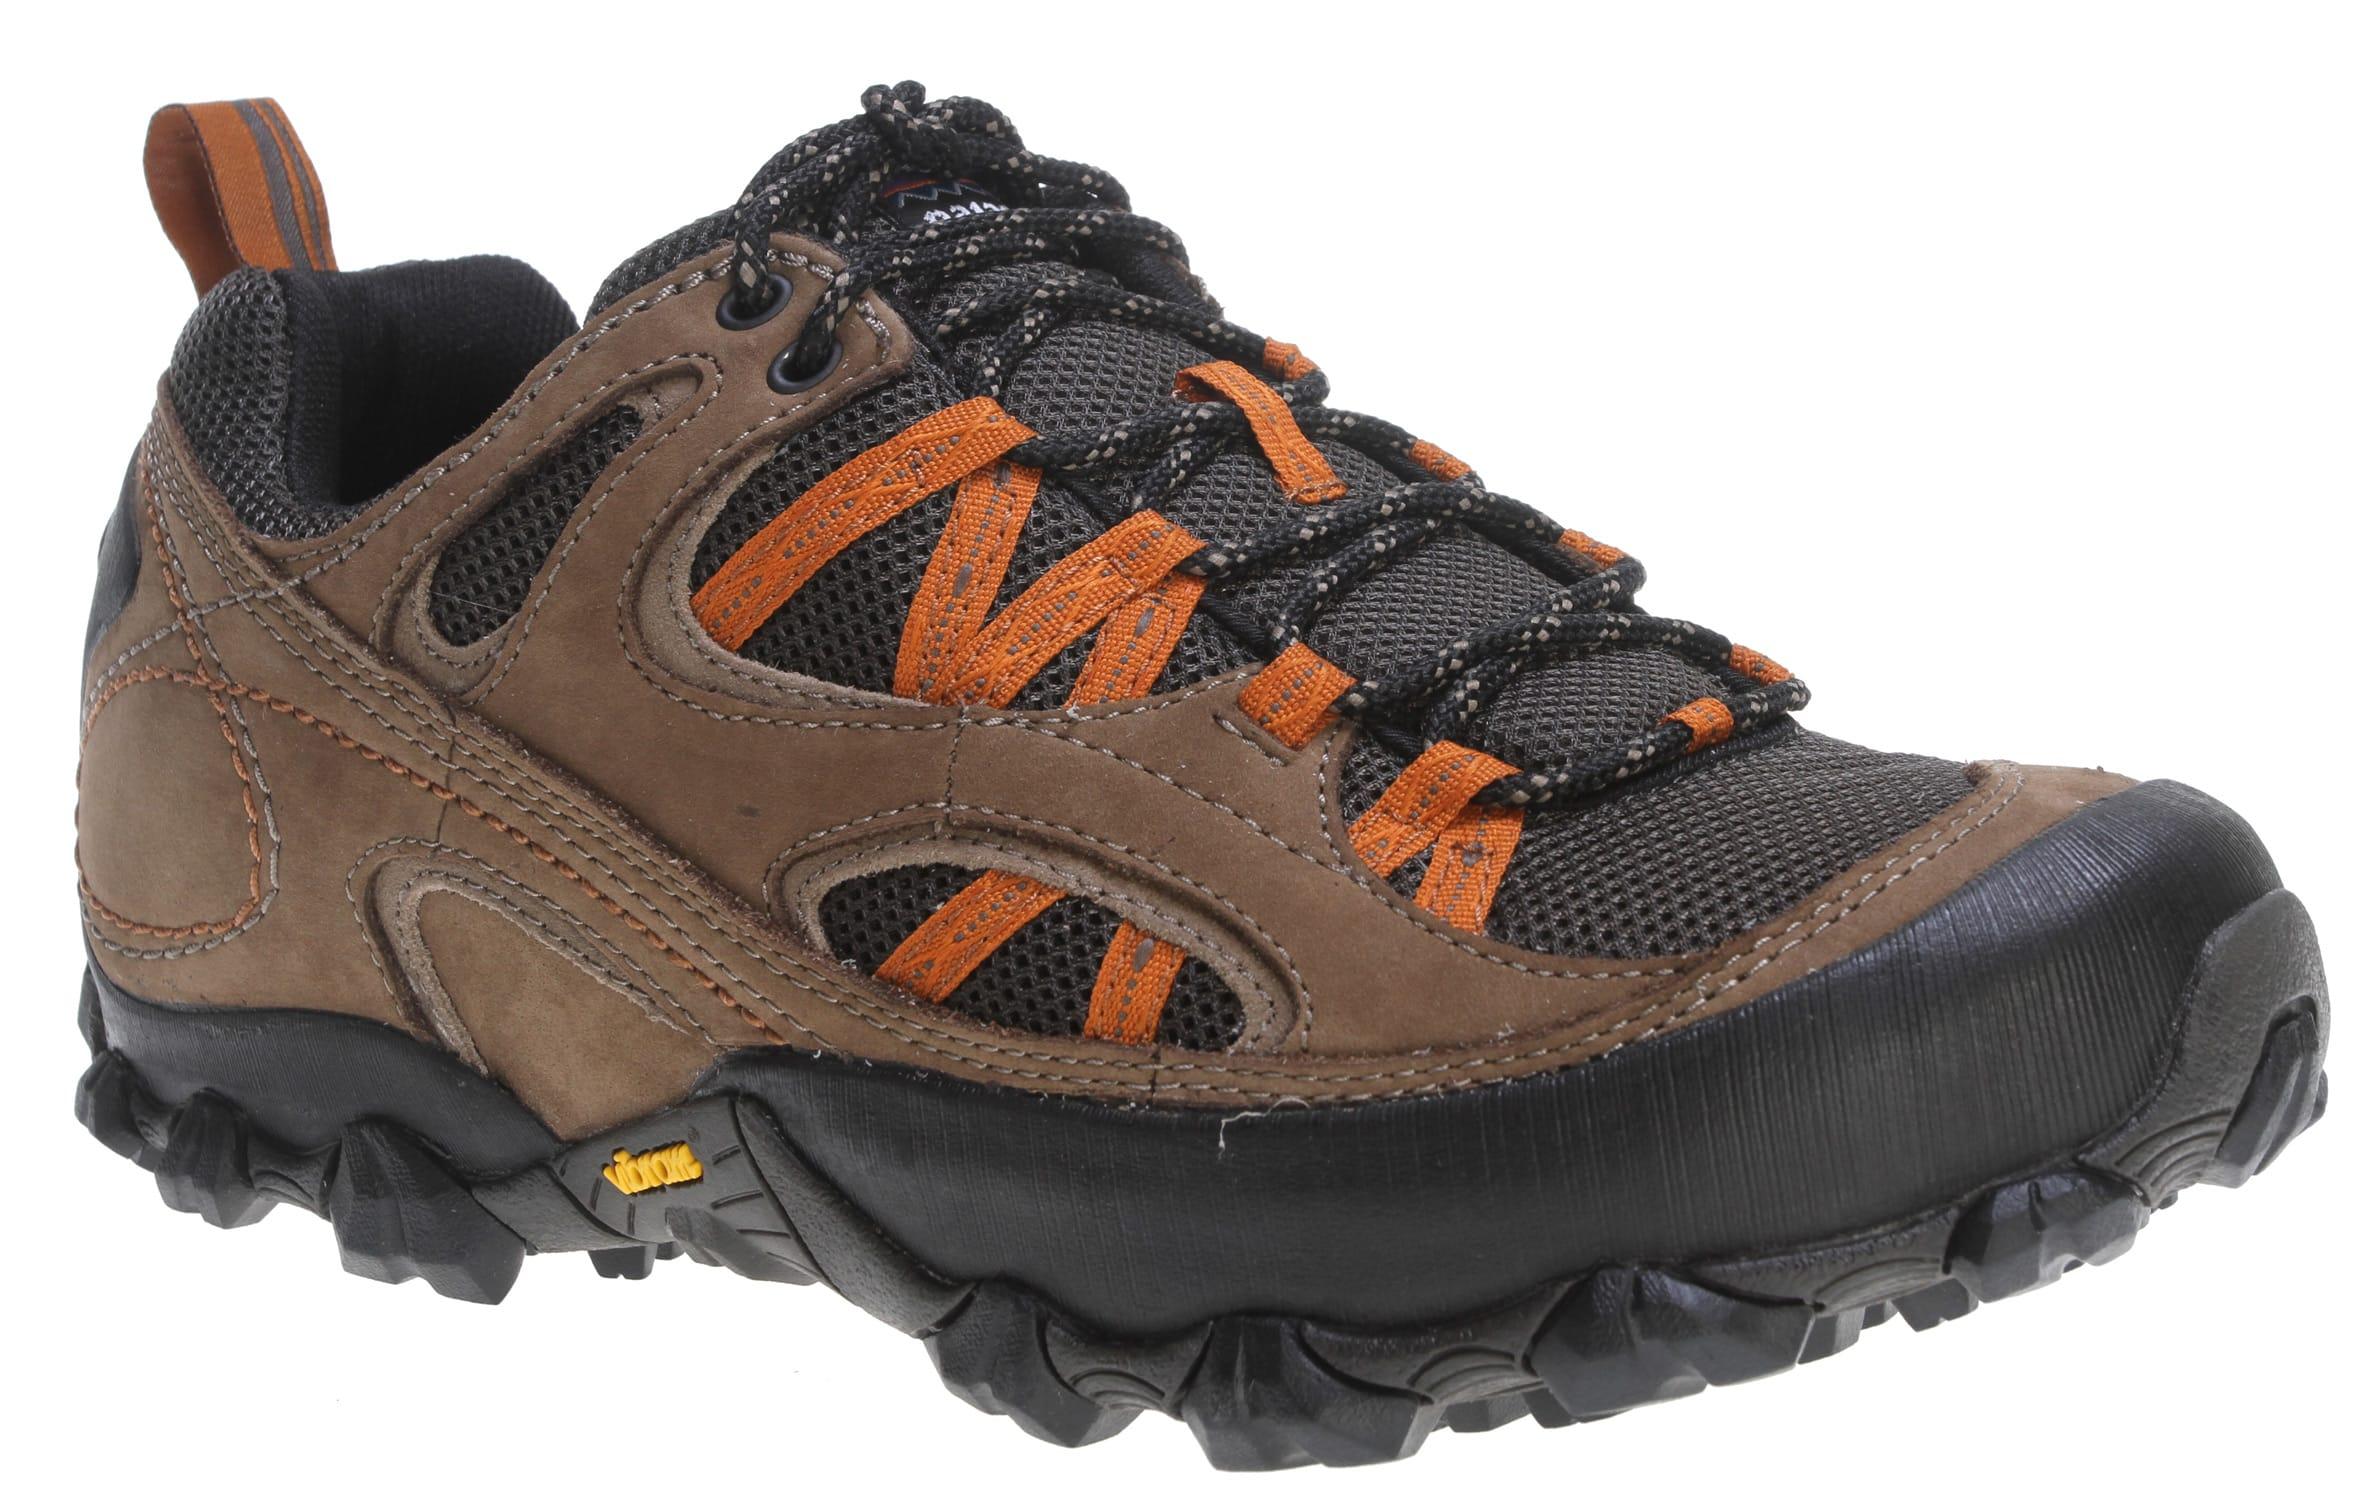 fe2236d3 Patagonia Drifter A/C Hiking Shoes - thumbnail 2